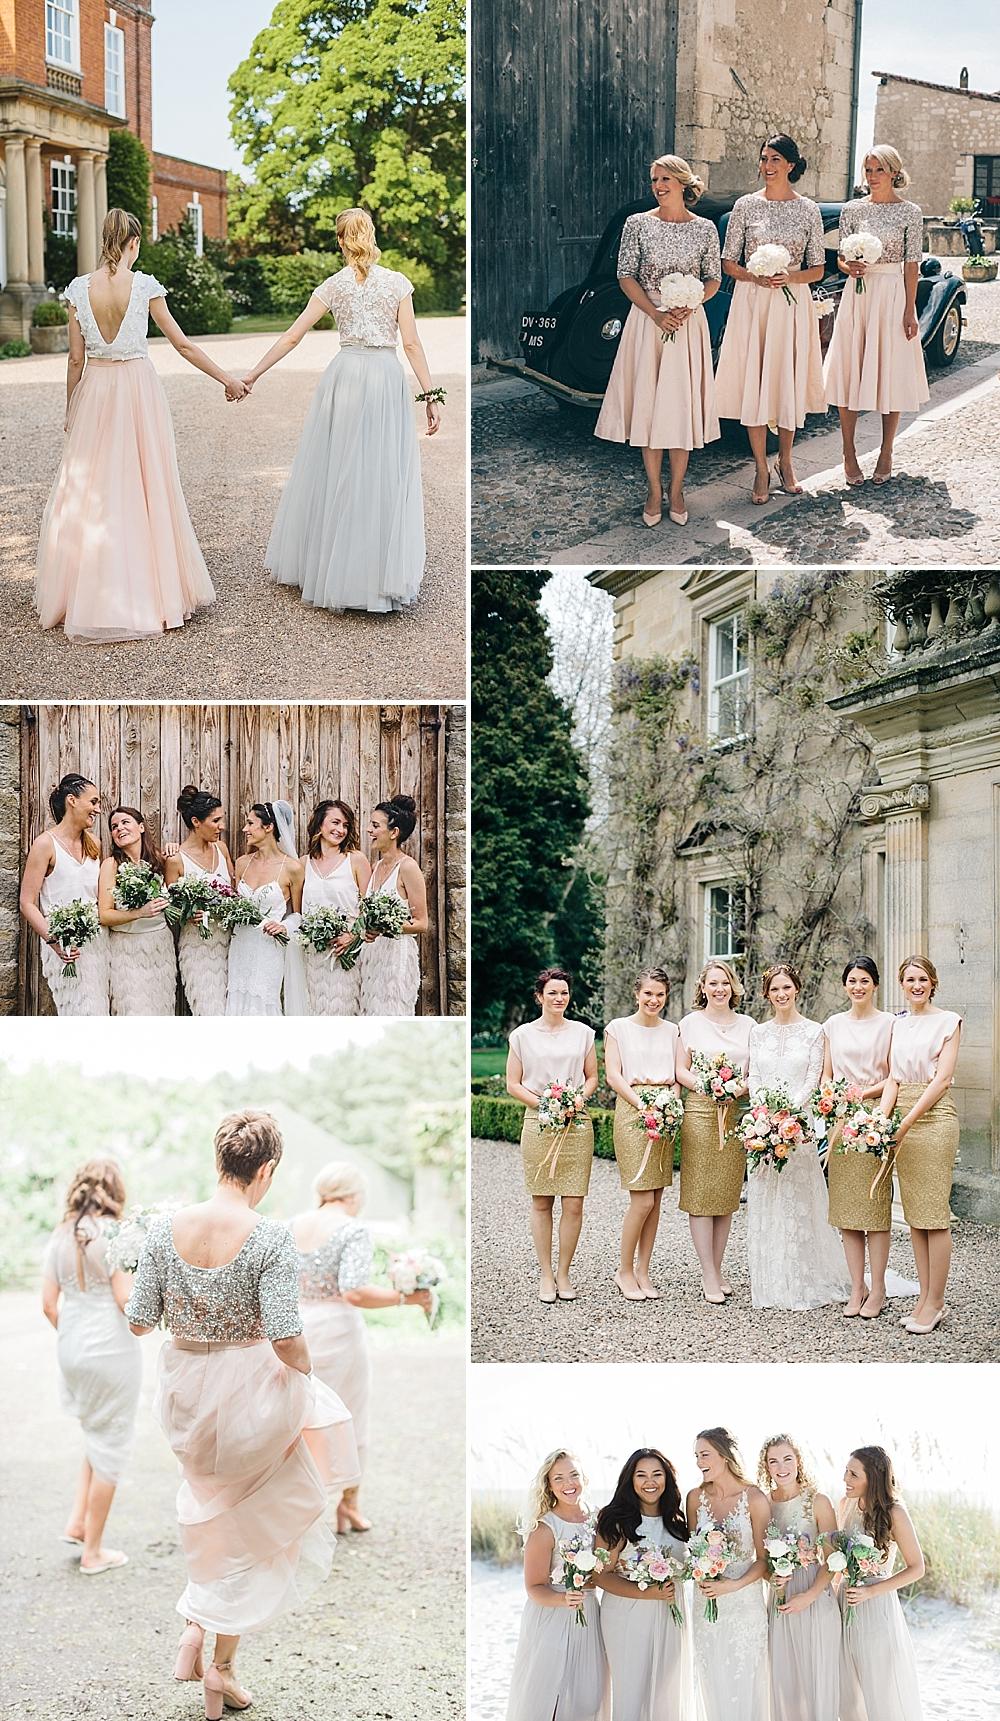 Bridesmaids Separates Inspiration